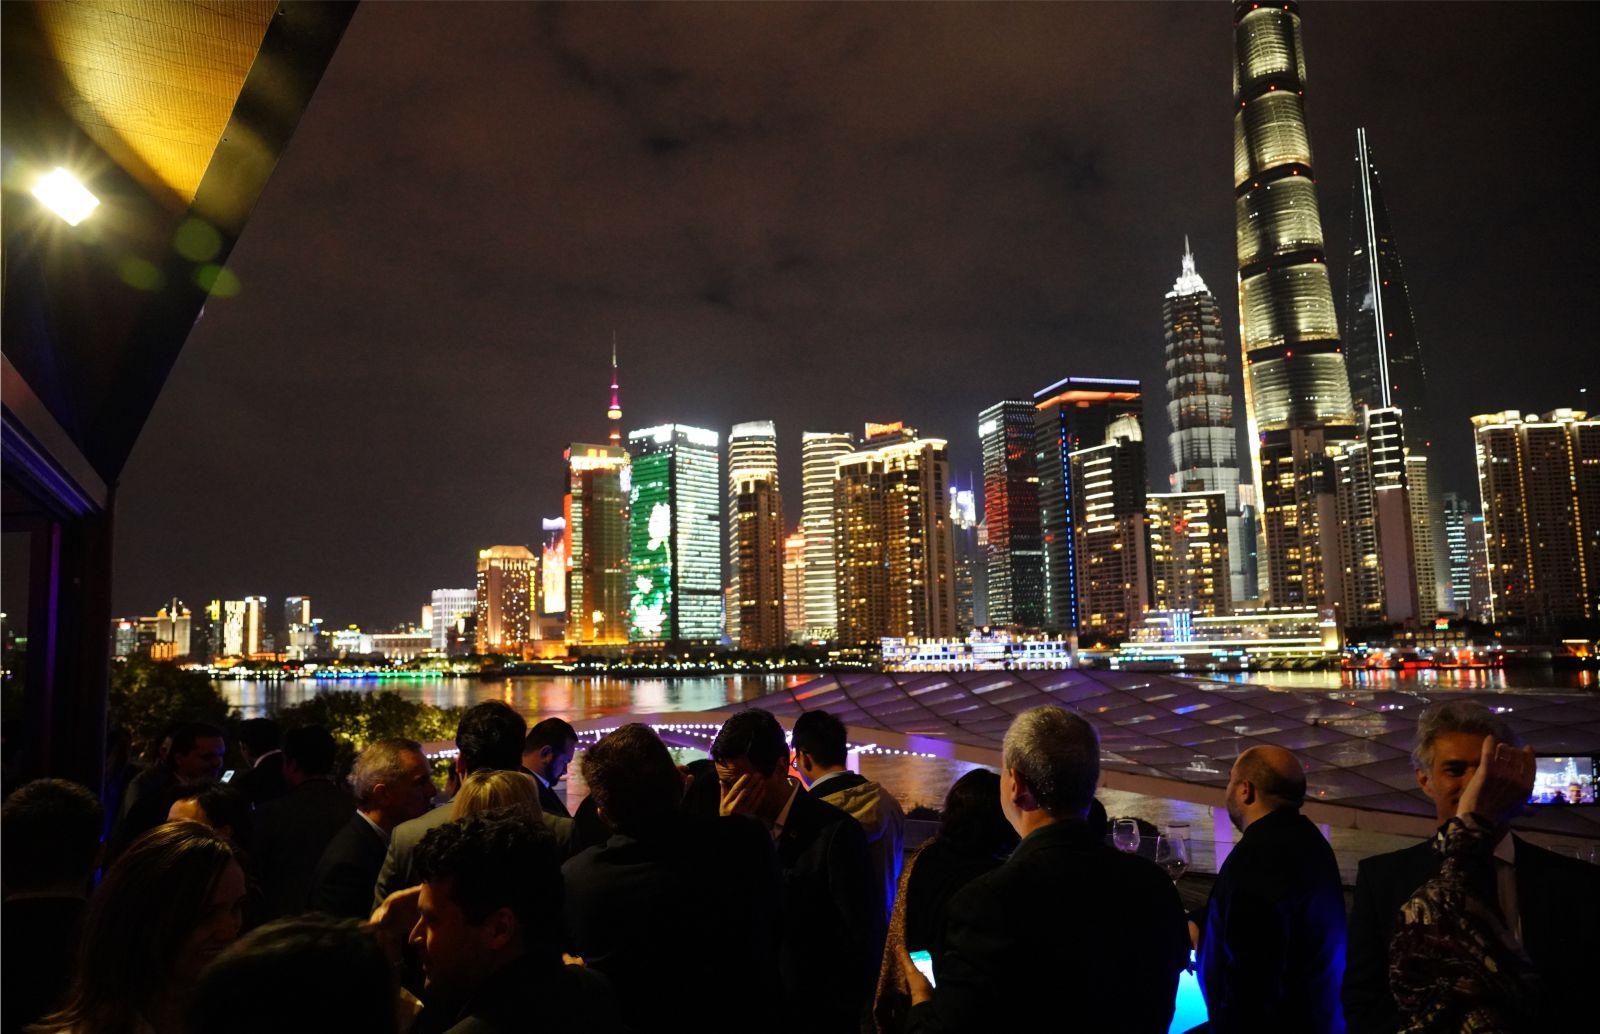 BRASIL CIIE EXPO WELCOME PARTY SHANGHAI